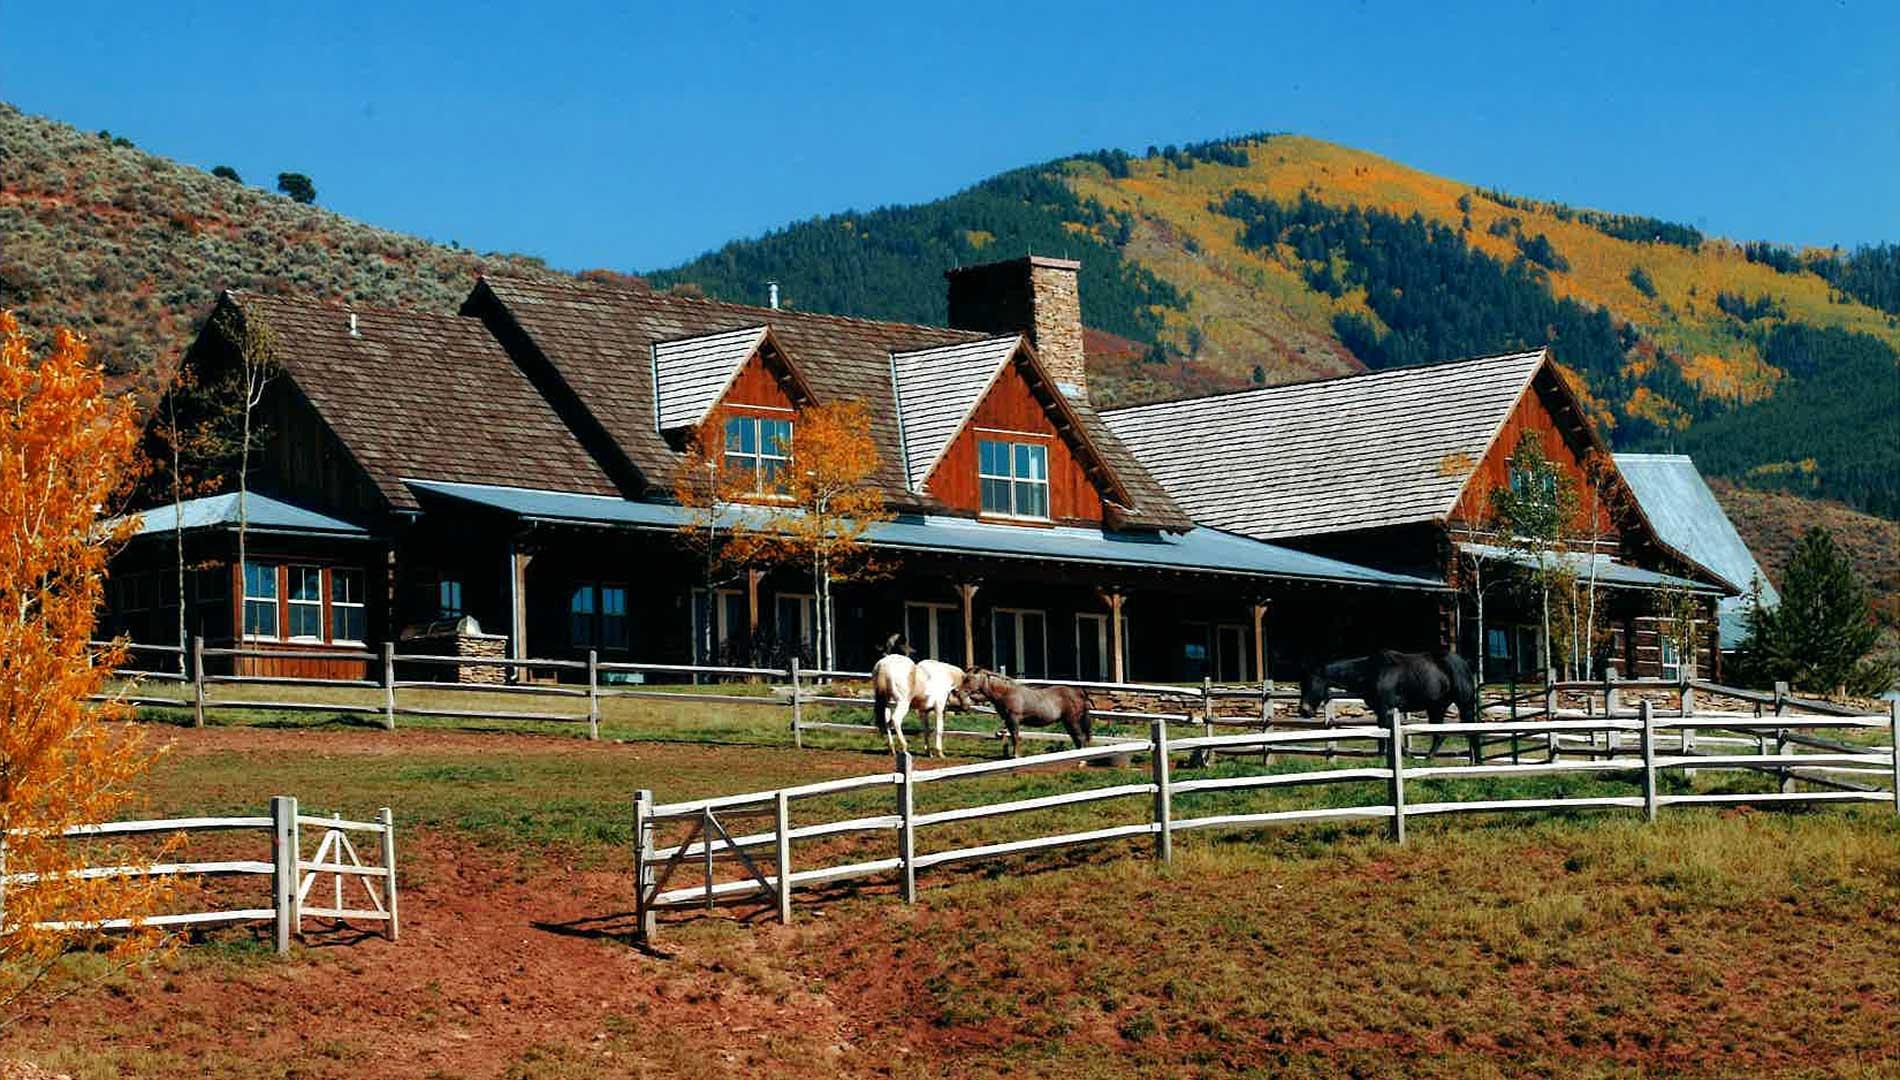 outside-day-aspen-ranch-elizabeth-robb-interiors-1900x1080